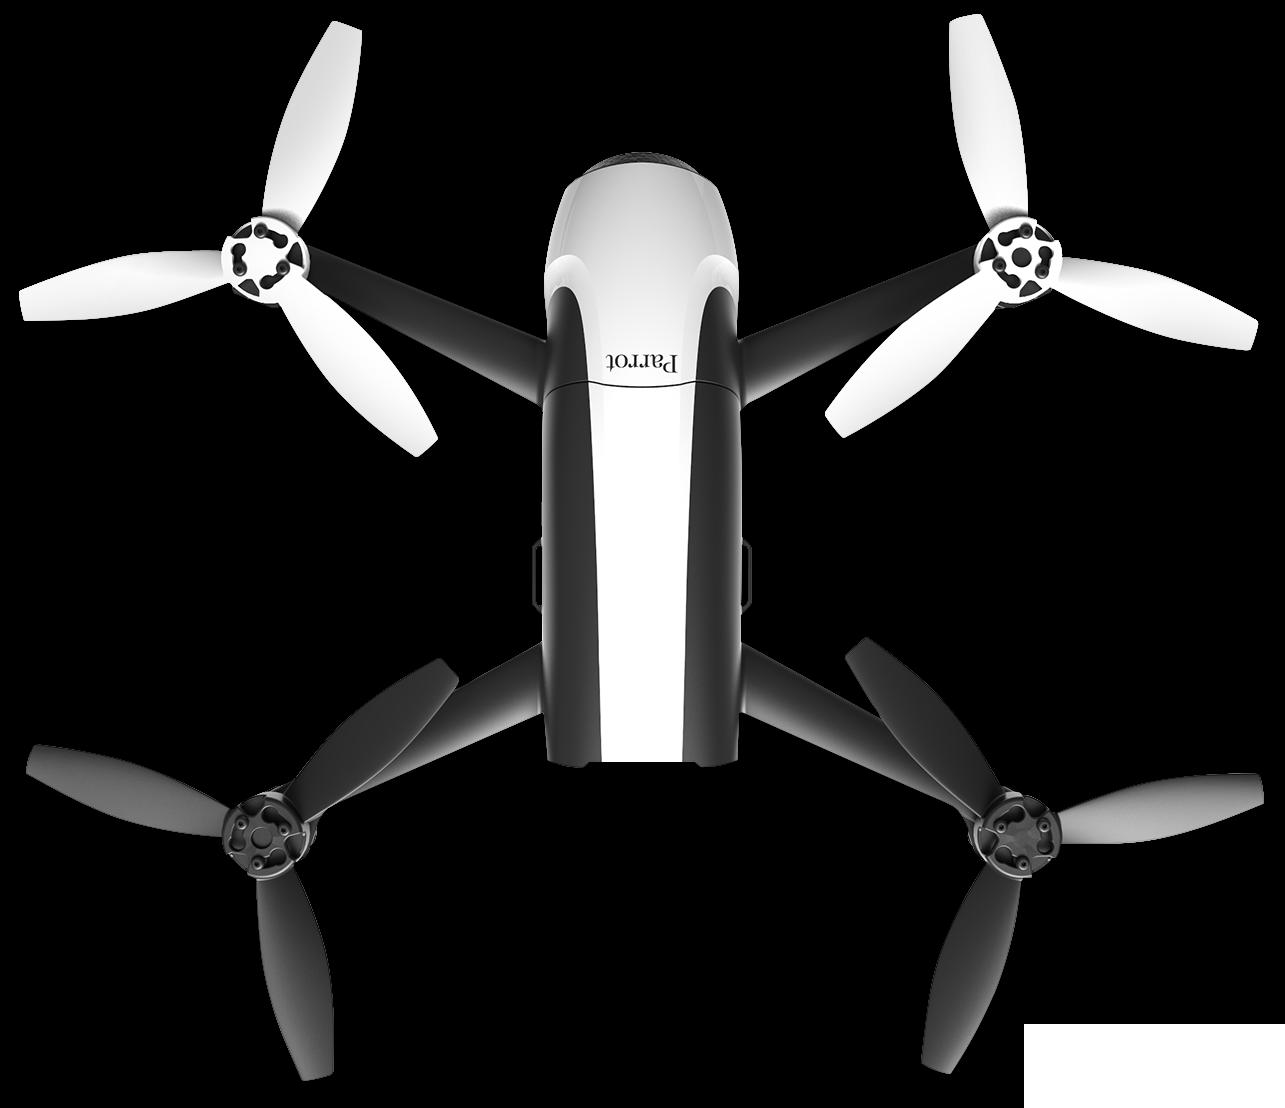 RE2PtuV?ver=1fc2 - Parrot Bebop 2 Drone